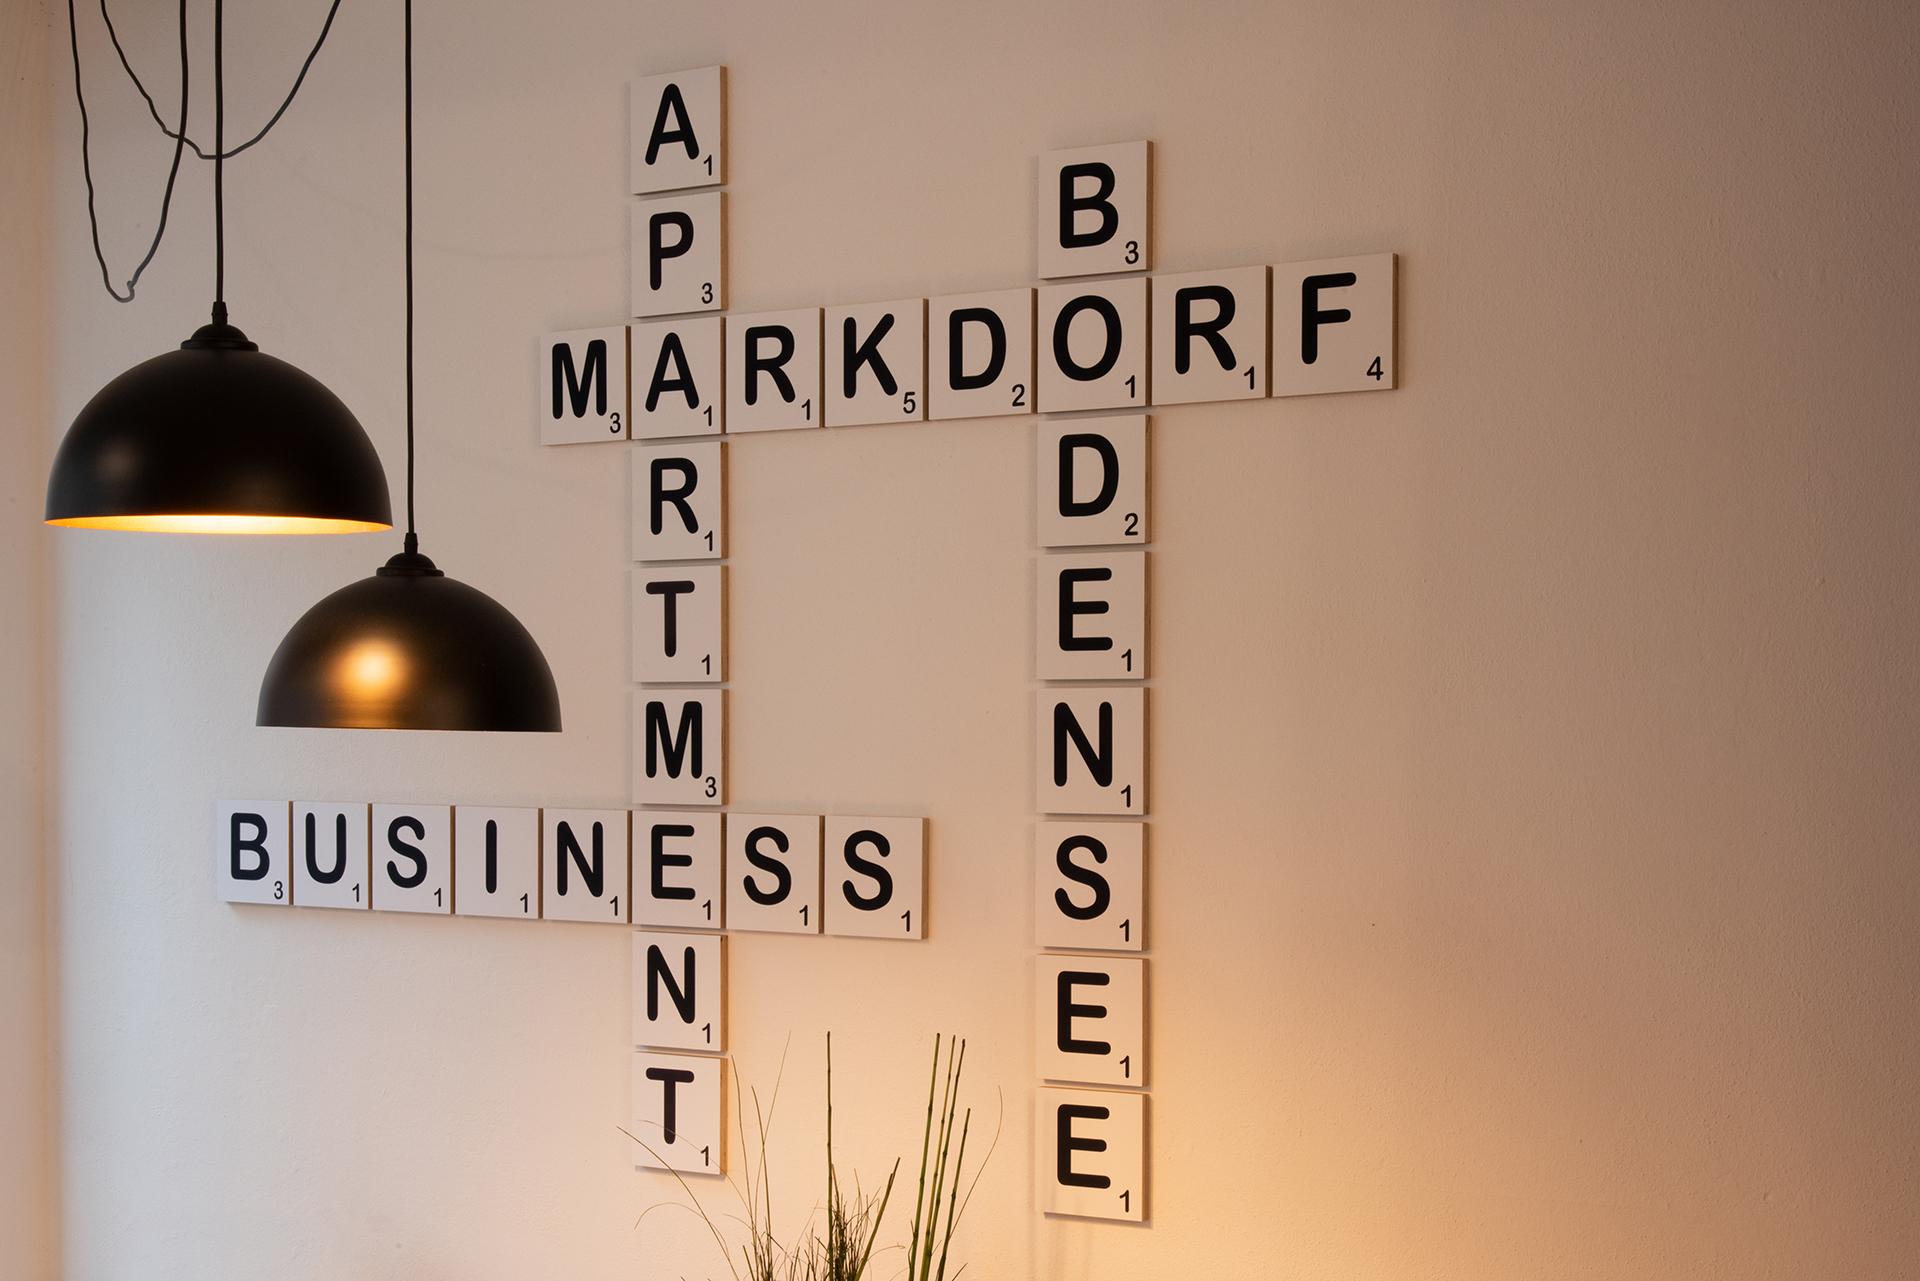 Business Apartment am Bodensee - Deko